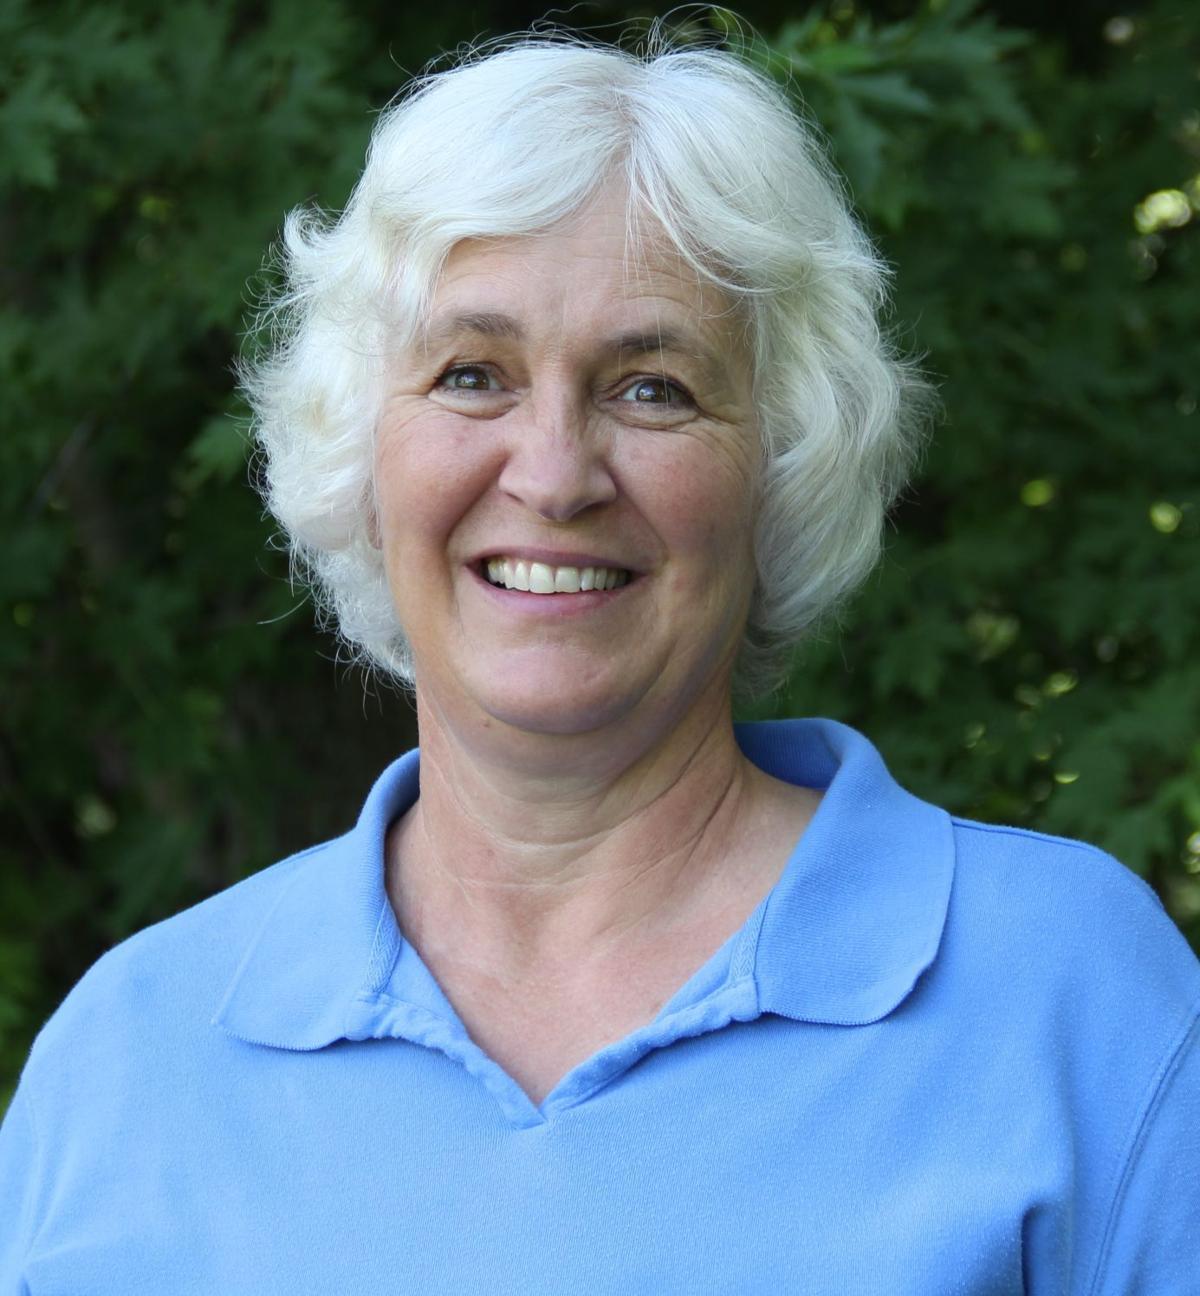 Rhonda Brady